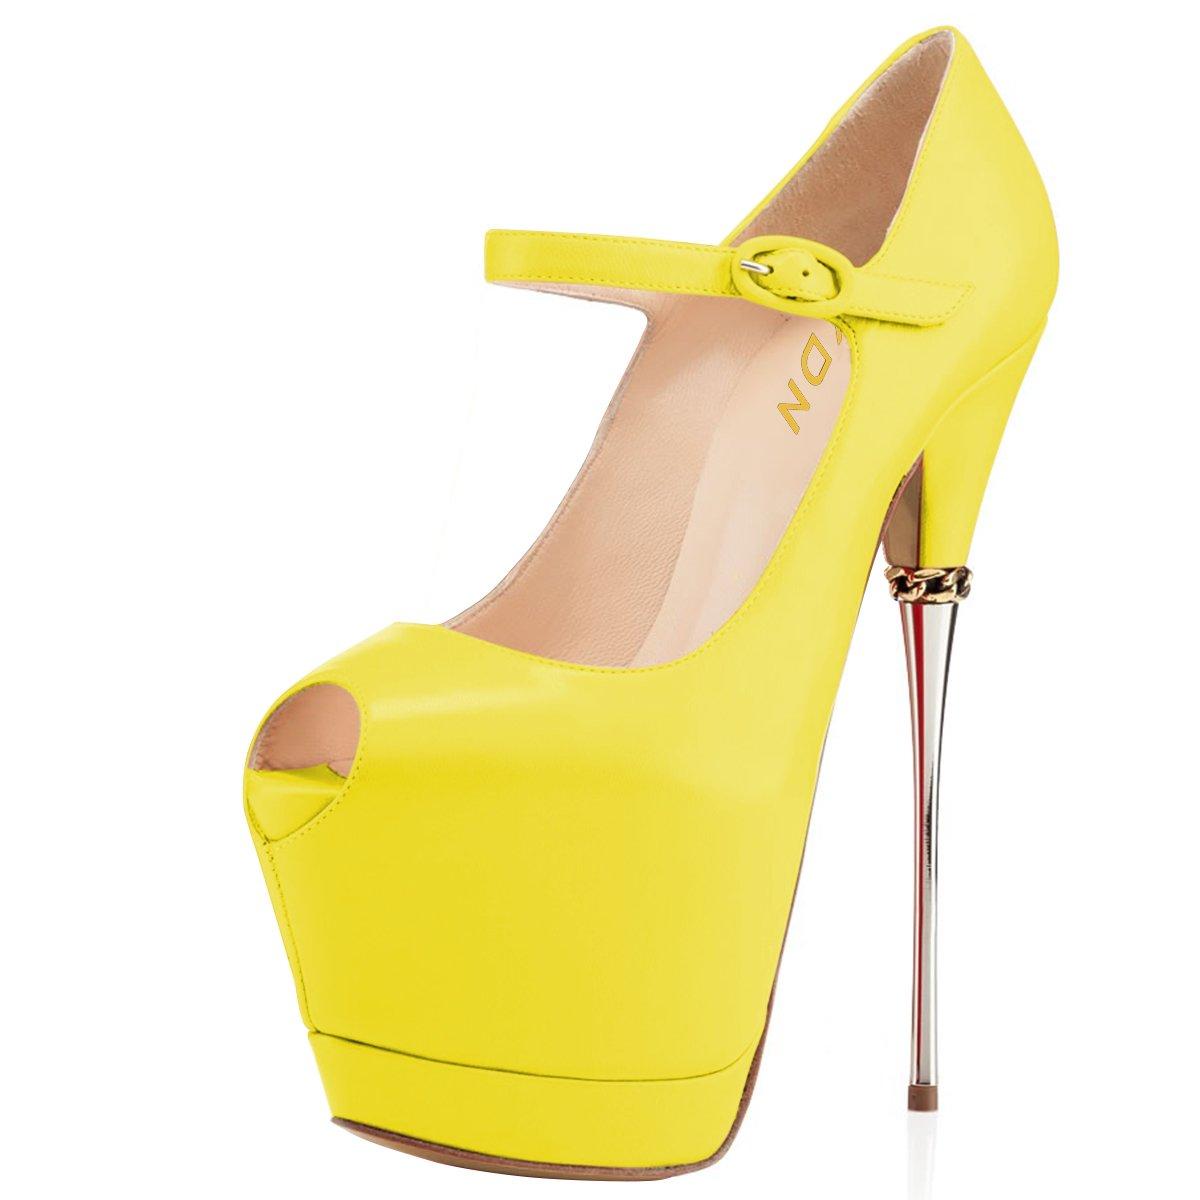 YDN Women Peep Toe Sky High Heels Platform Pumps Ankle Straps Shoes Metal Stilettos B07F1PJRWY 8.5 M US|Yellow-pu